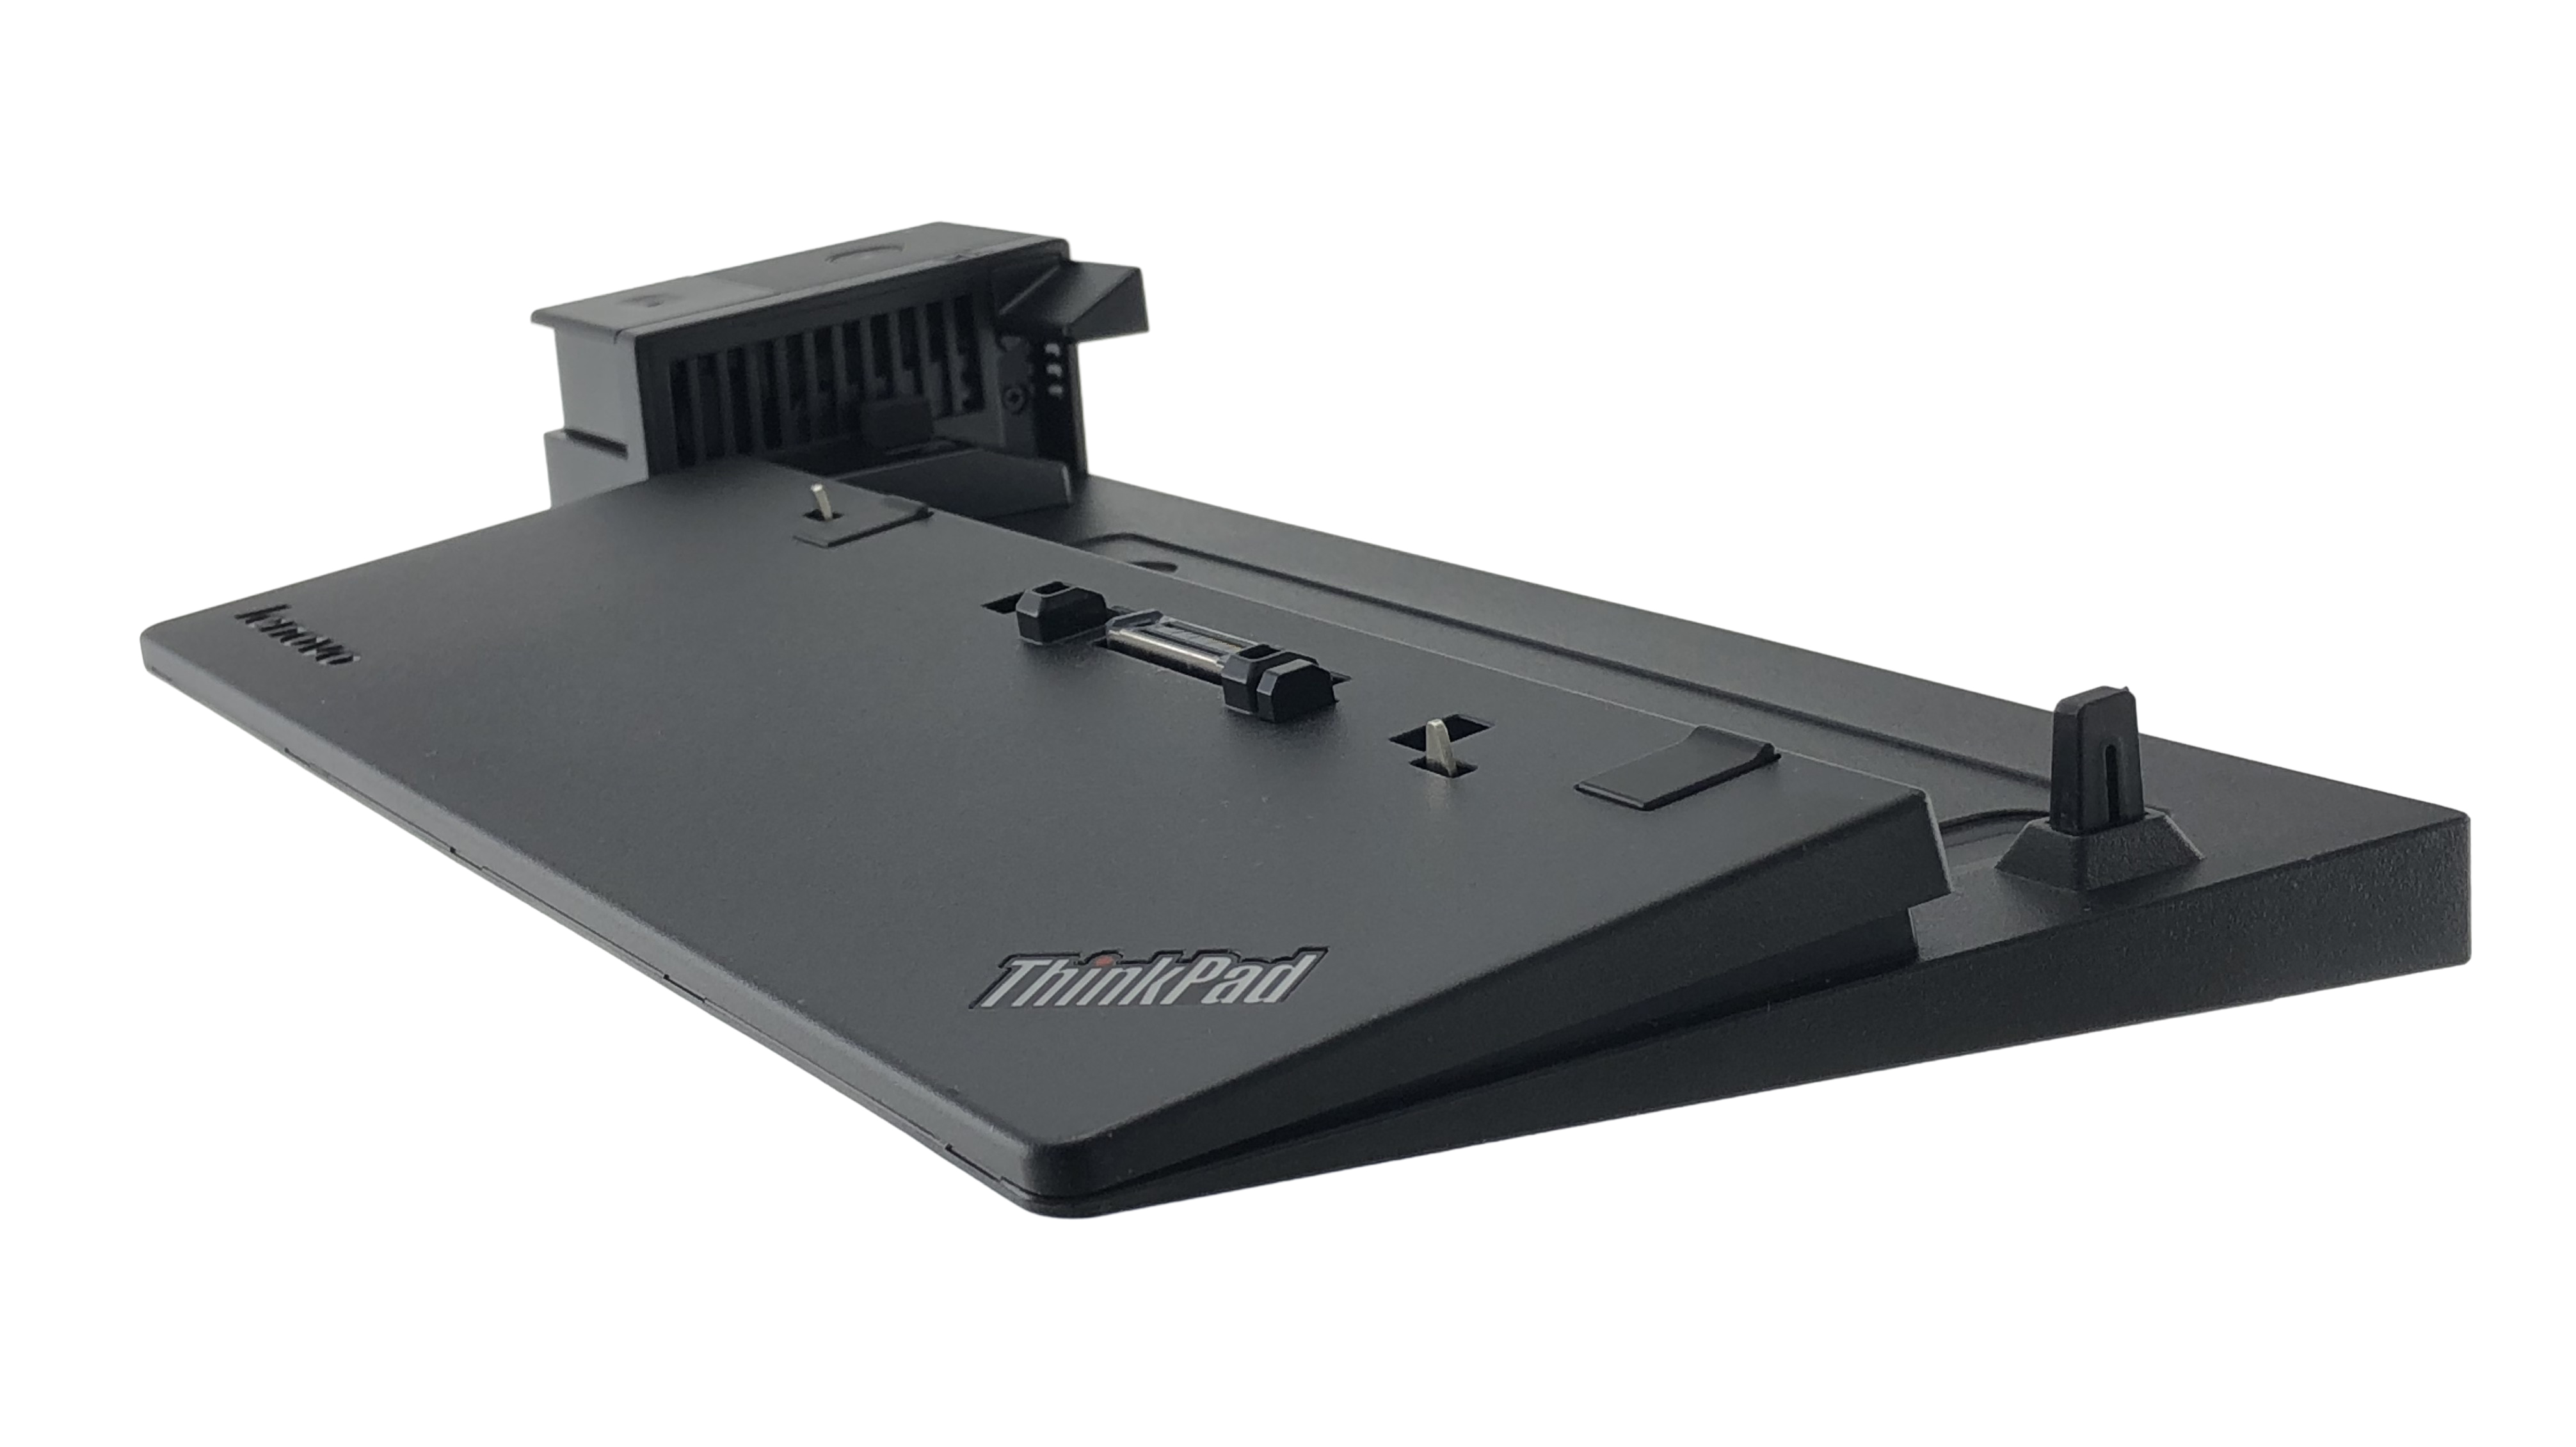 ThinkPad L440 ThinkPad L450 ThinkPad L460 ThinkPad L470 ThinkPad L540 ThinkPad L560 ThinkPad L570 ThinkPad P50s ThinkPad P51s